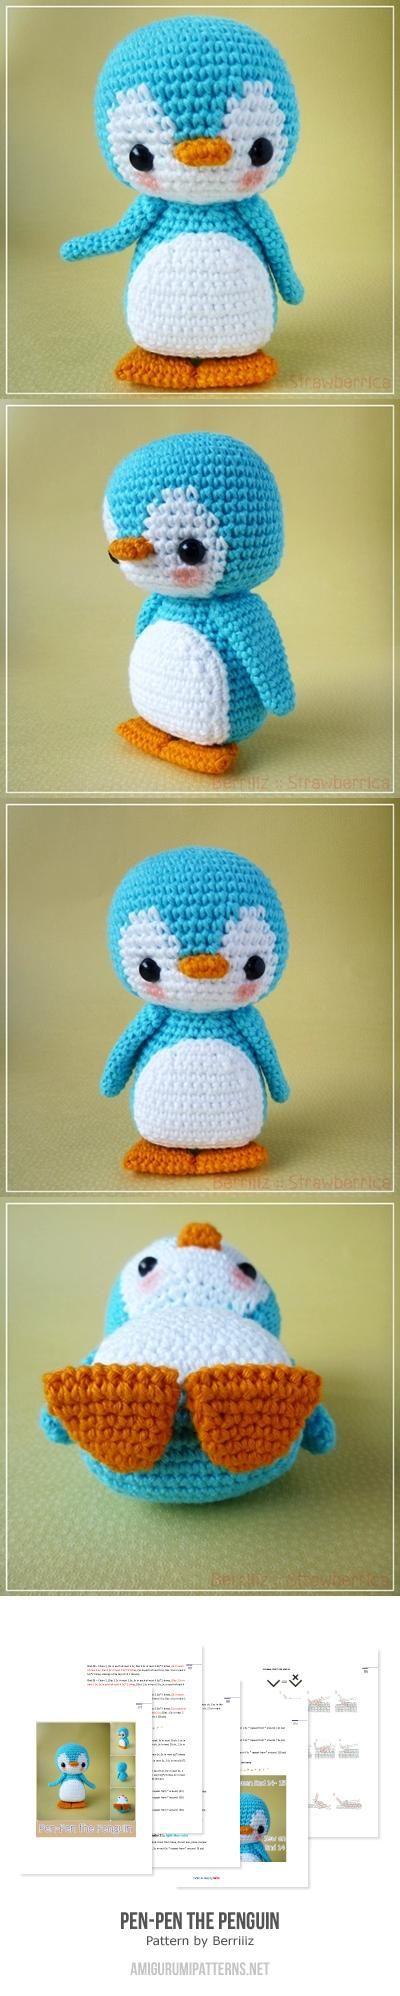 PenPen the Penguin - amigurumi pattern